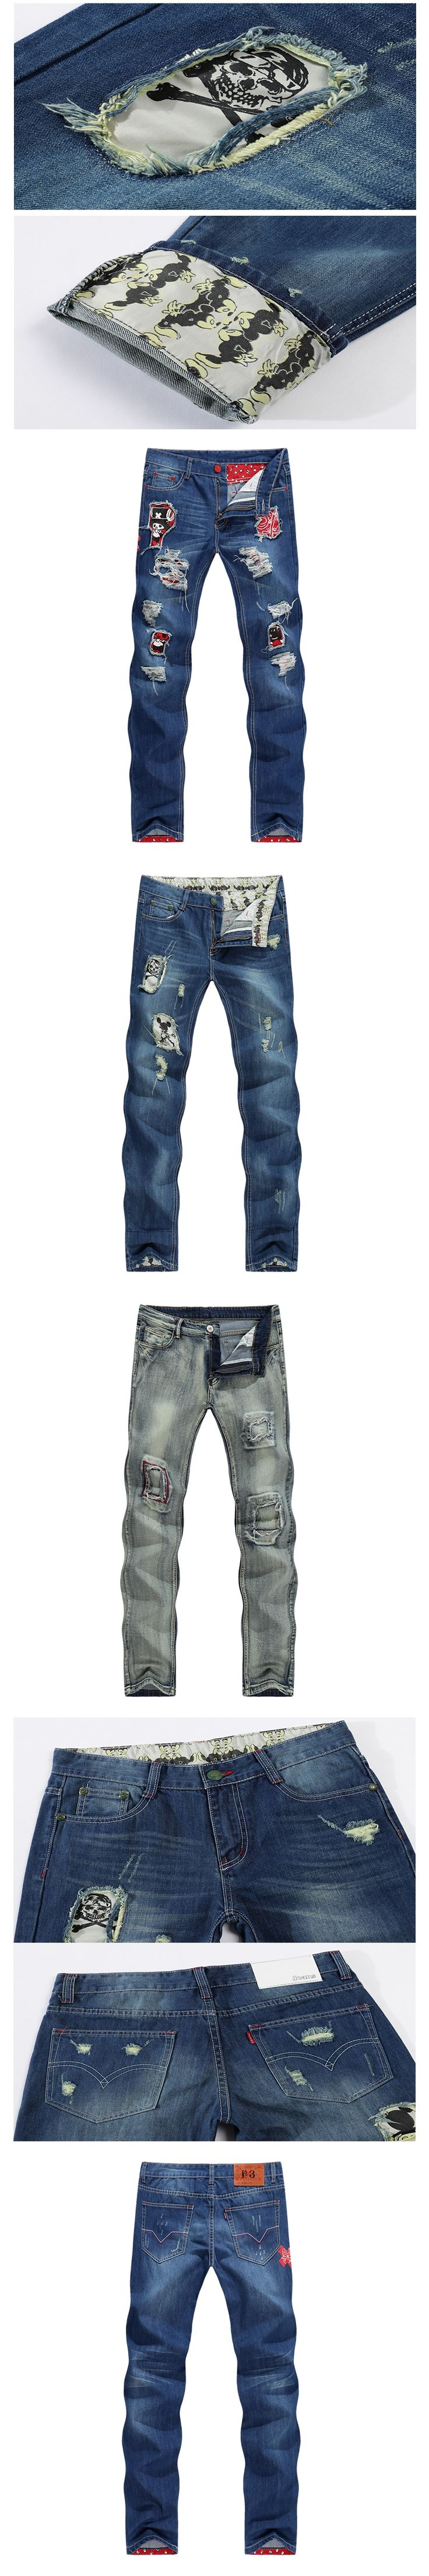 2017 Skull Character Designer Jeans Men Tapered Slim Europe American Style Blue Pencils Retro Grey Vintage Ripped Broken Pants